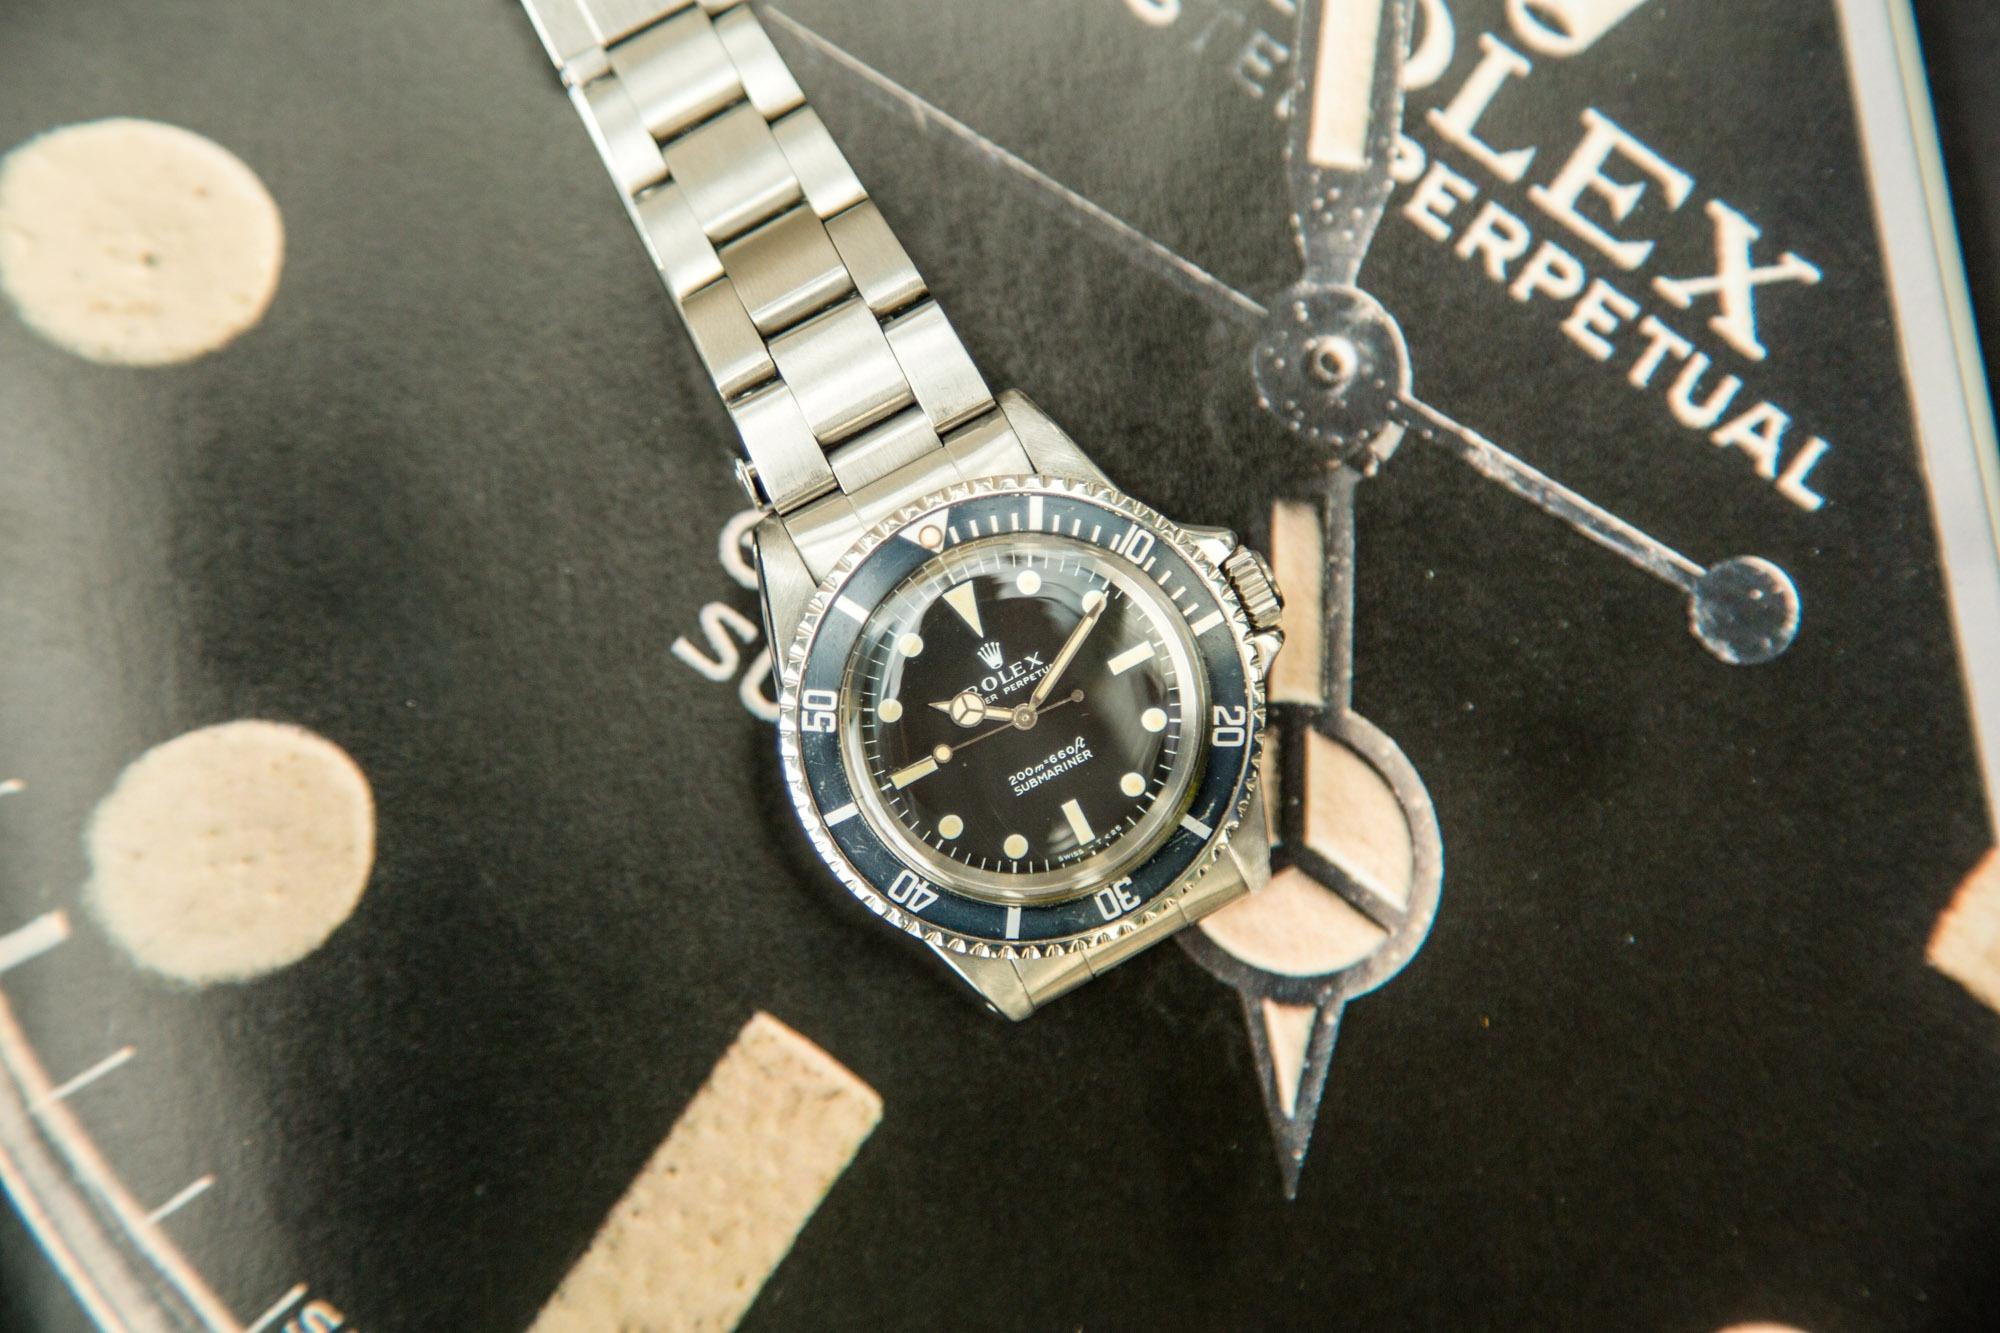 Vestiaire Collective - Montres Anciennes - Rolex 5513 Submariner